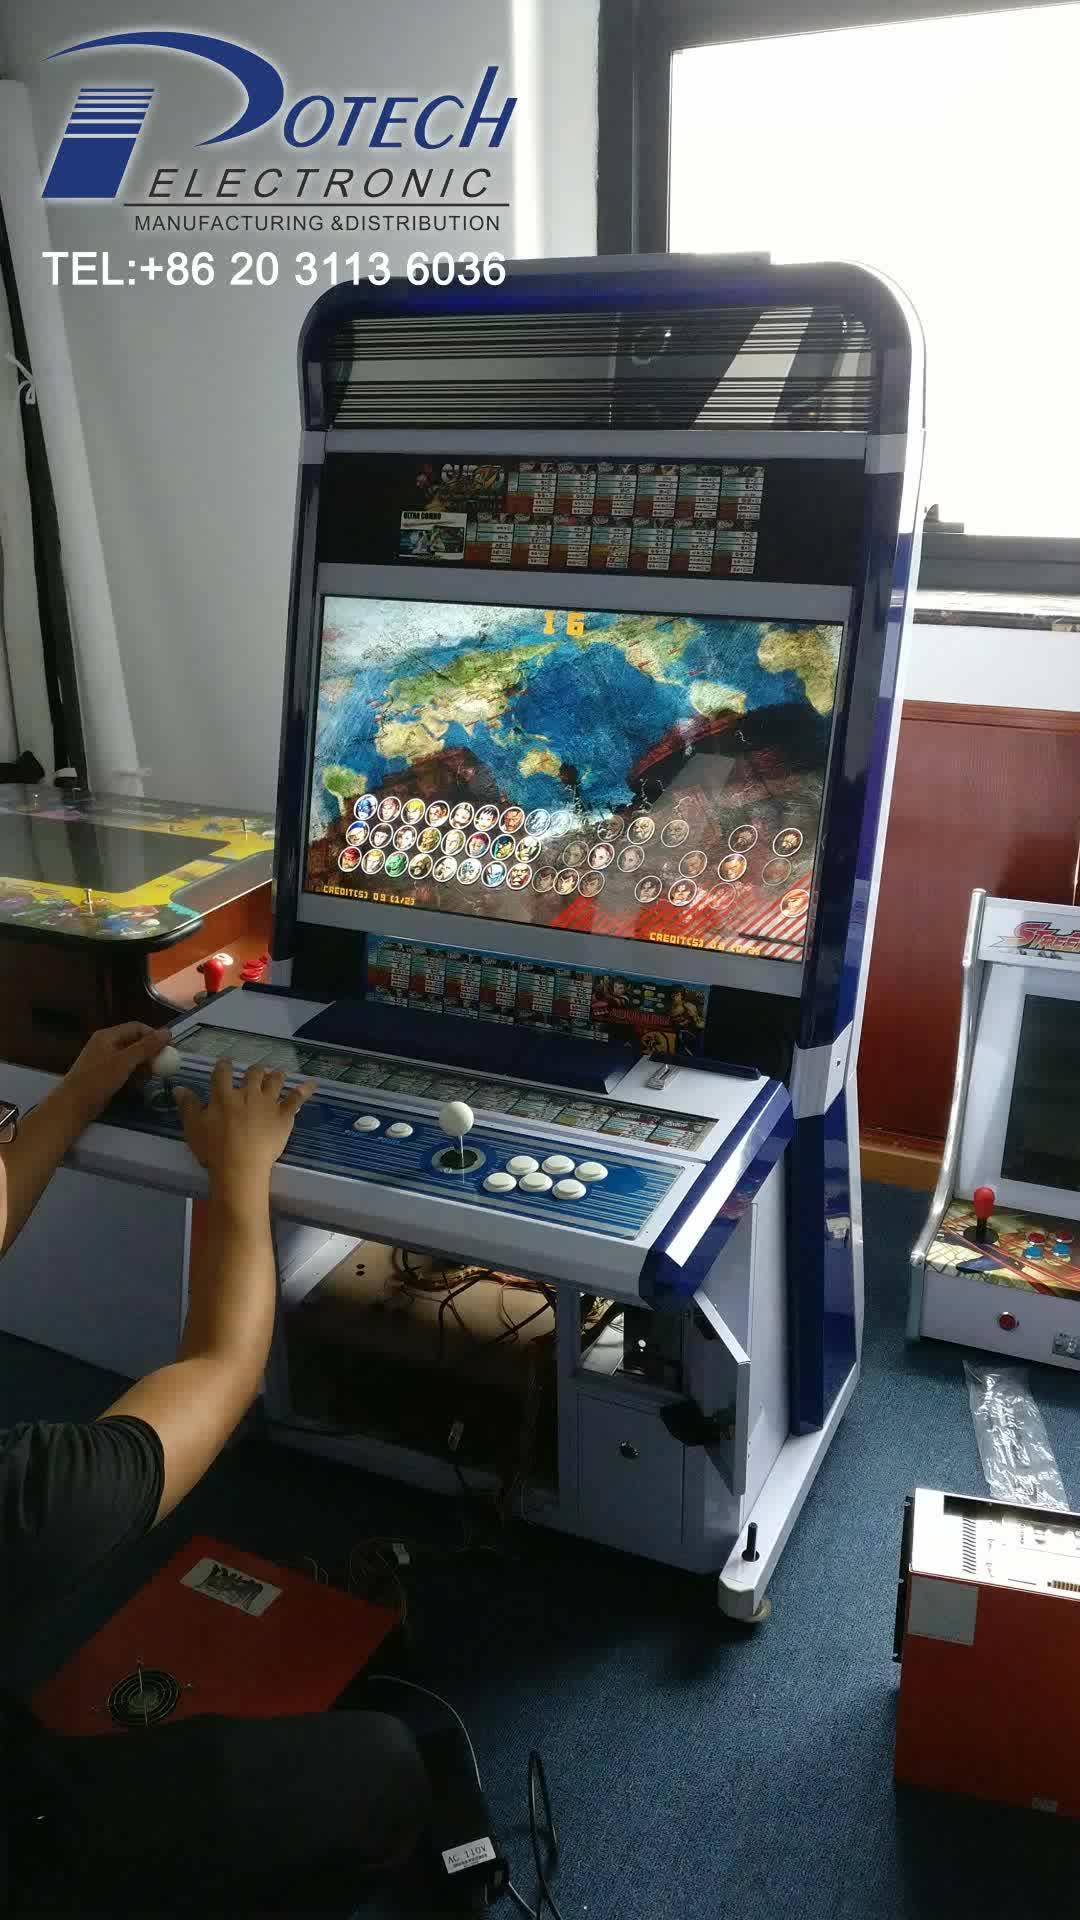 taito vewlix-l cabinet arcade game machine with super street fighter 4 & Taito Vewlix-l Cabinet Arcade Game Machine With Super Street Fighter ...